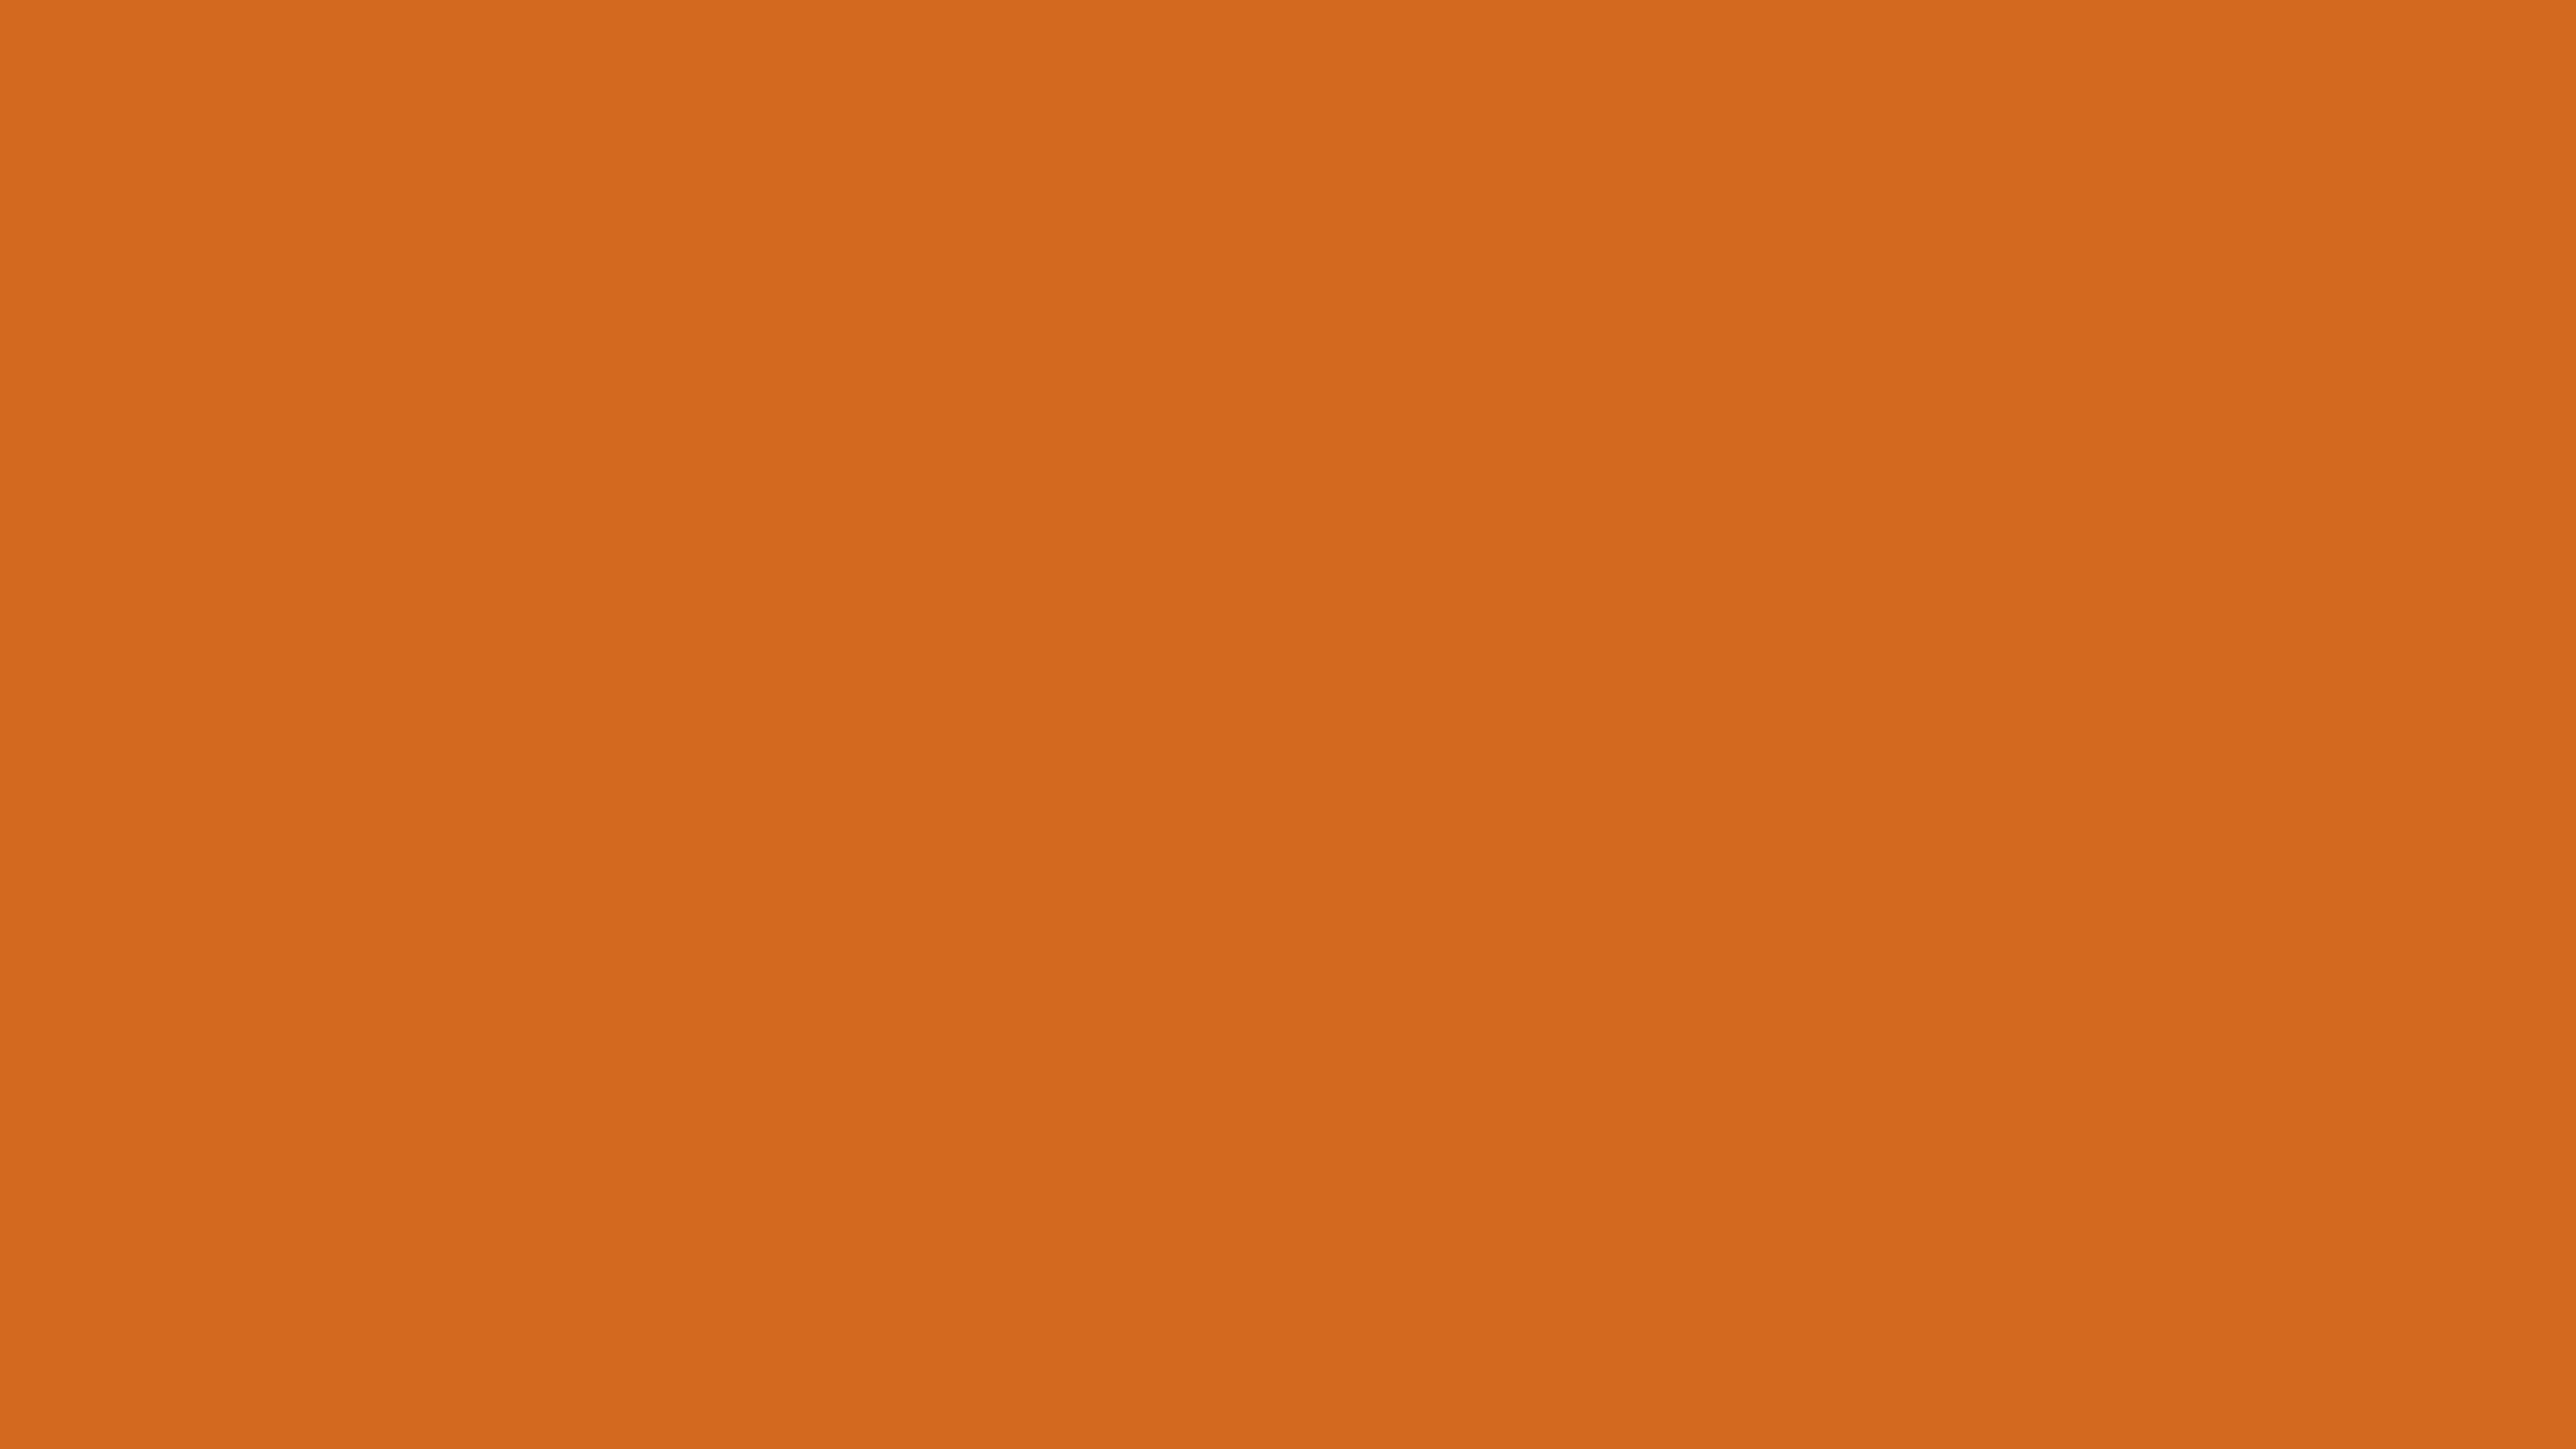 3840x2160 Cinnamon Solid Color Background